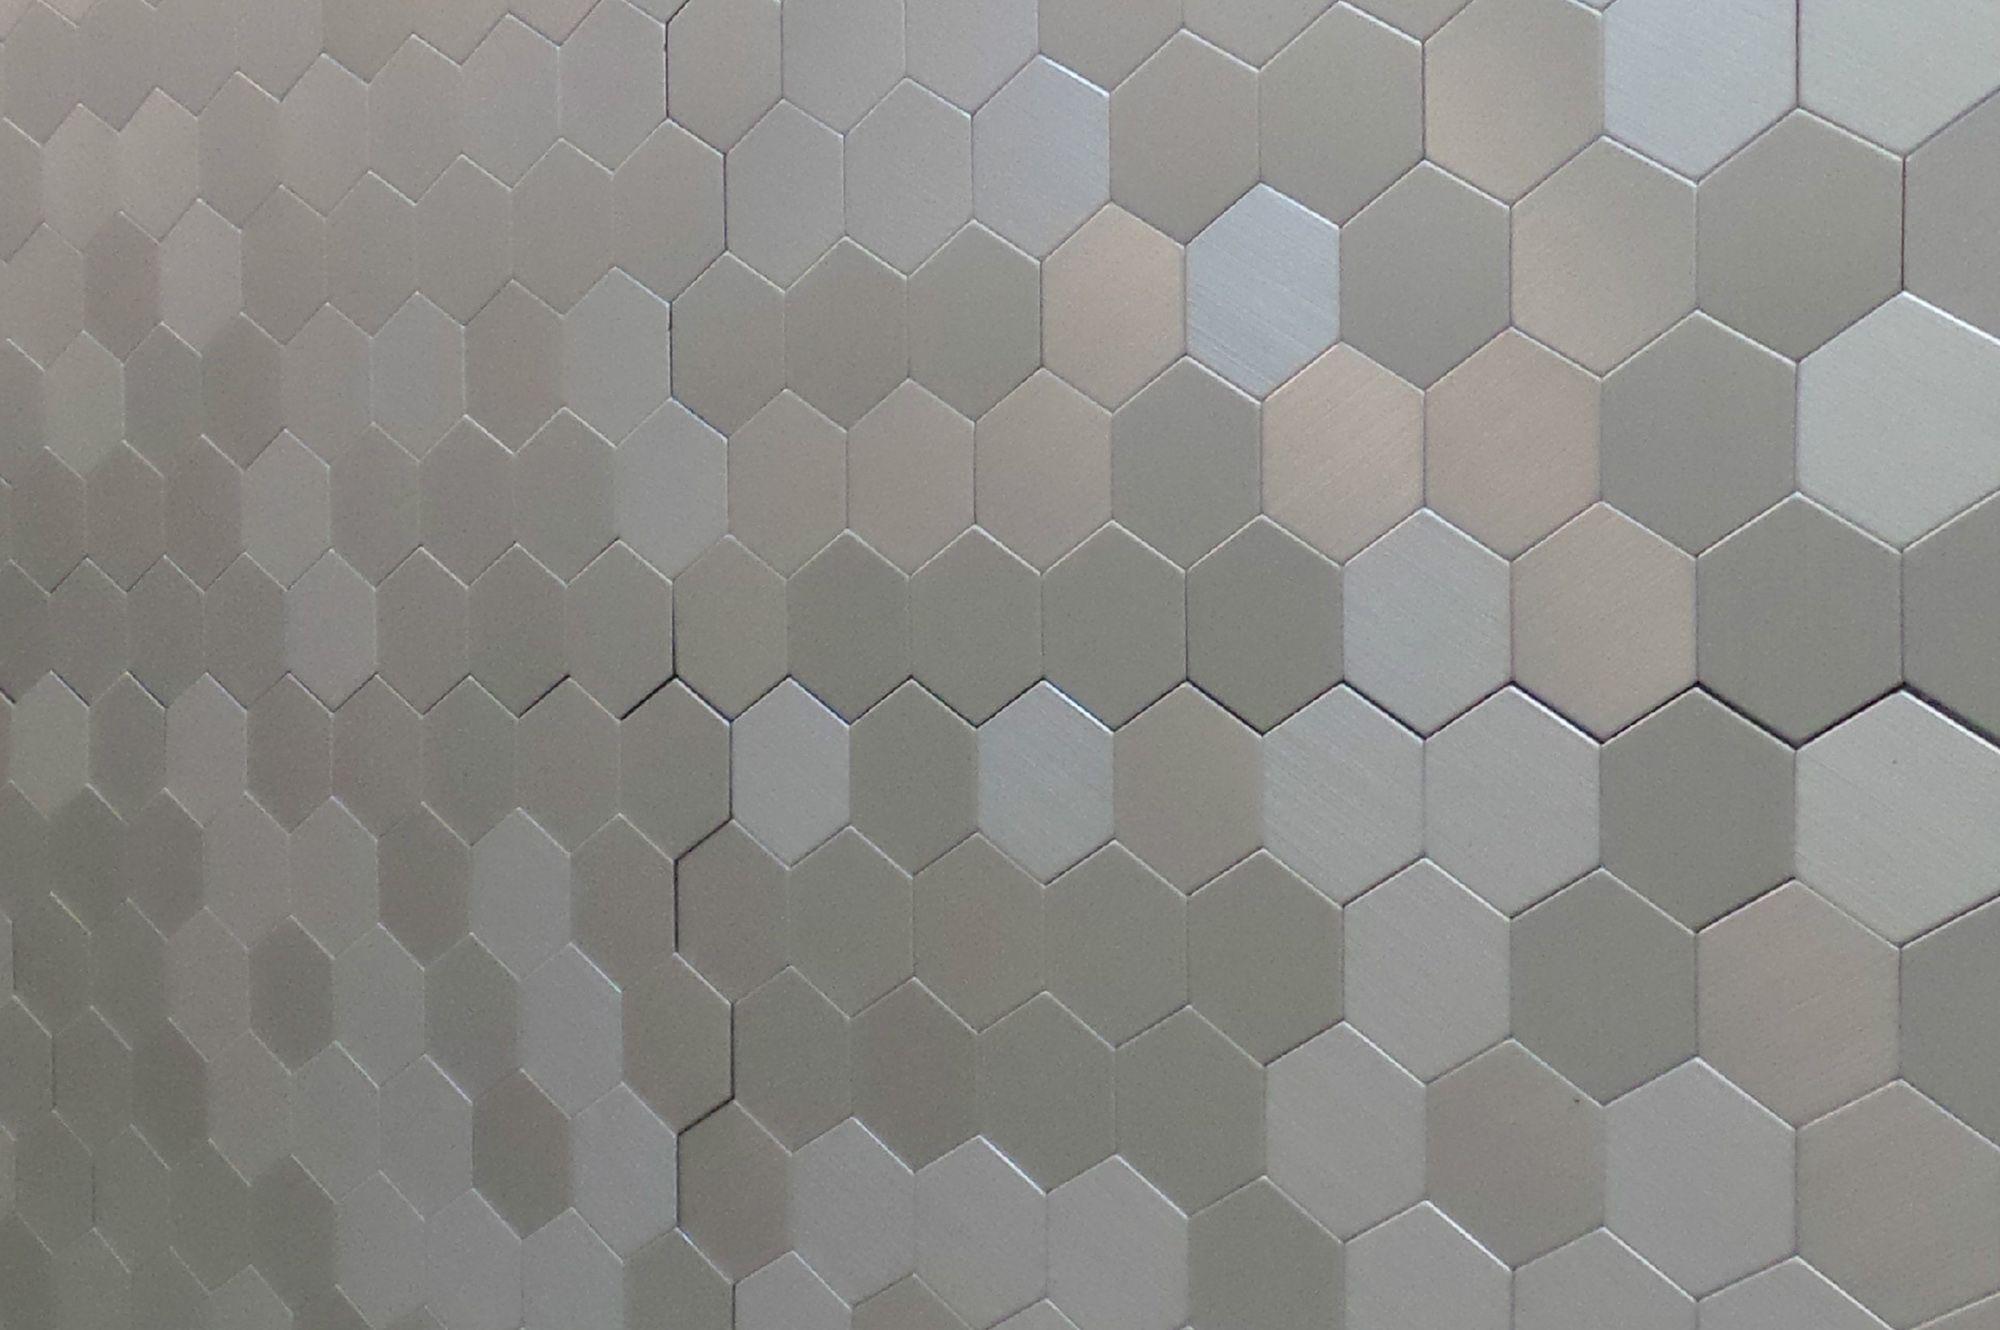 Gl Stone Tile Mosaic Tile Peel Stick Metal Series Mosaic Tiles Mosaic Stone Tiles